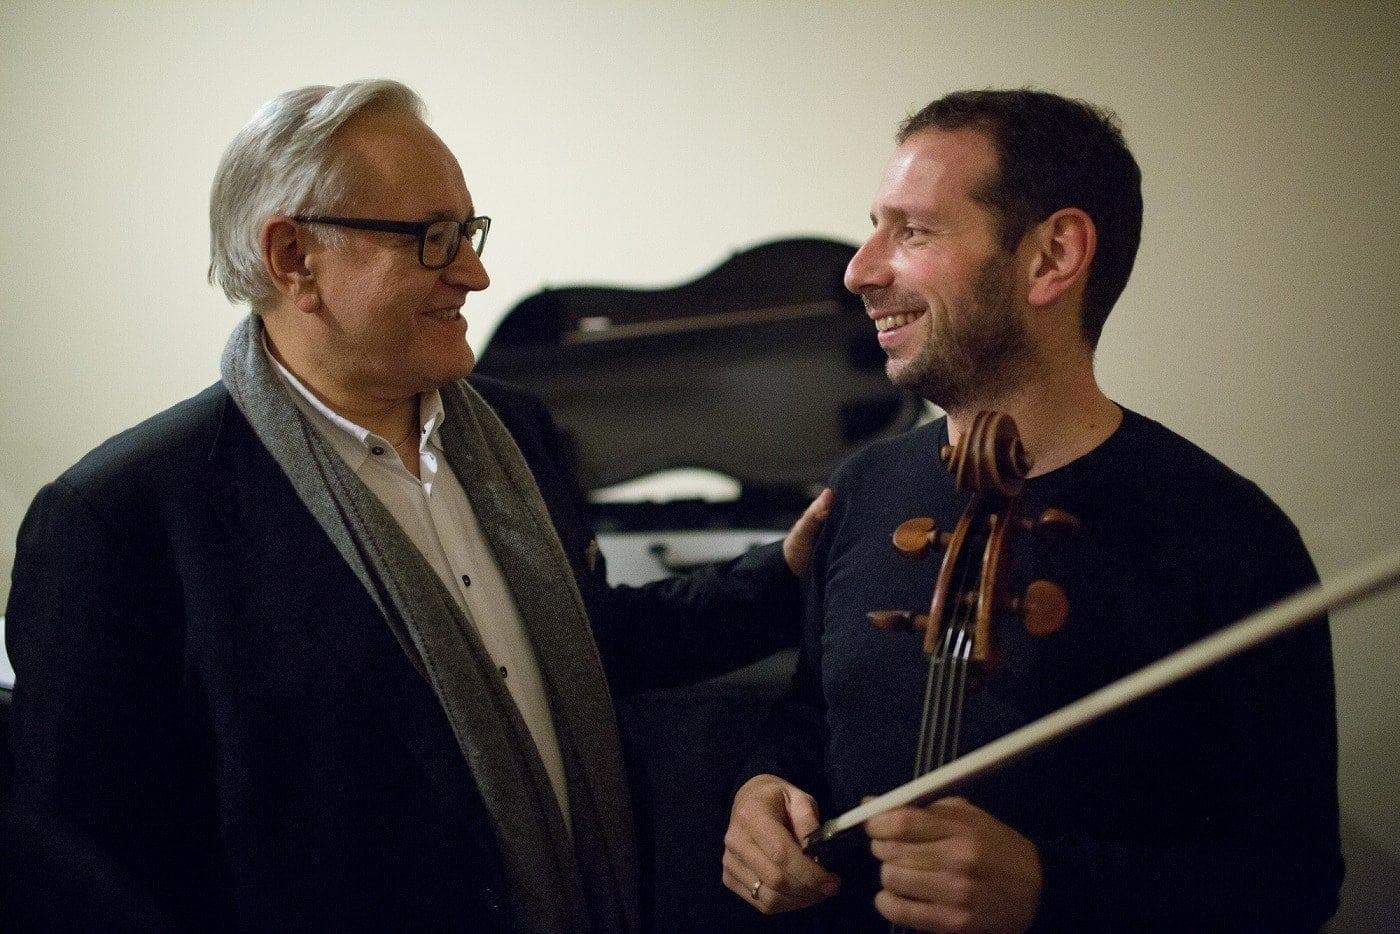 Давид Герингас и Борис Андрианов. Фото - Евгений Евтюхов